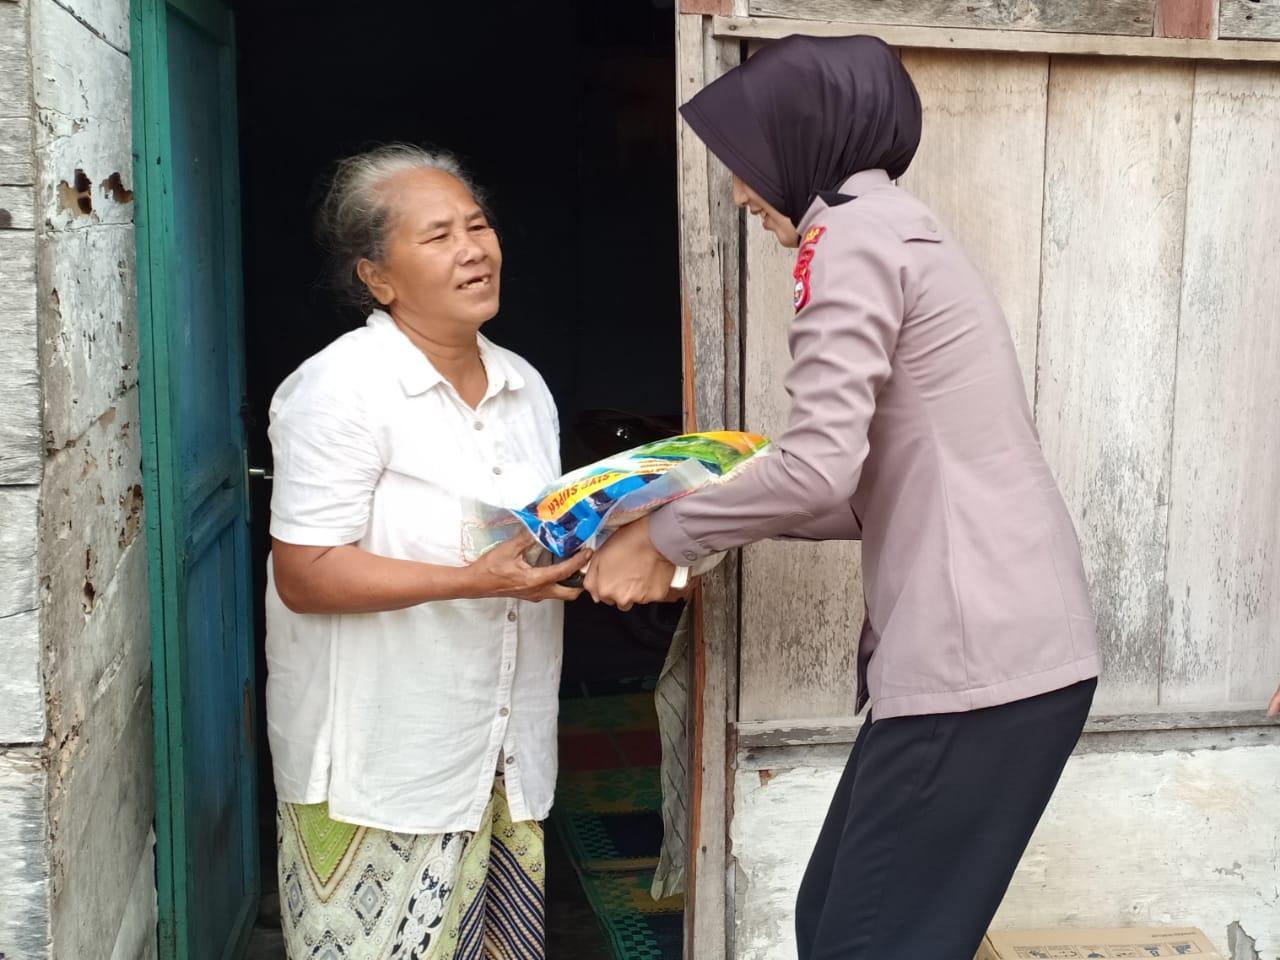 Jumat Berbagi, Polwan Polres Bengkulu Santuni Warga Kampung Bahari